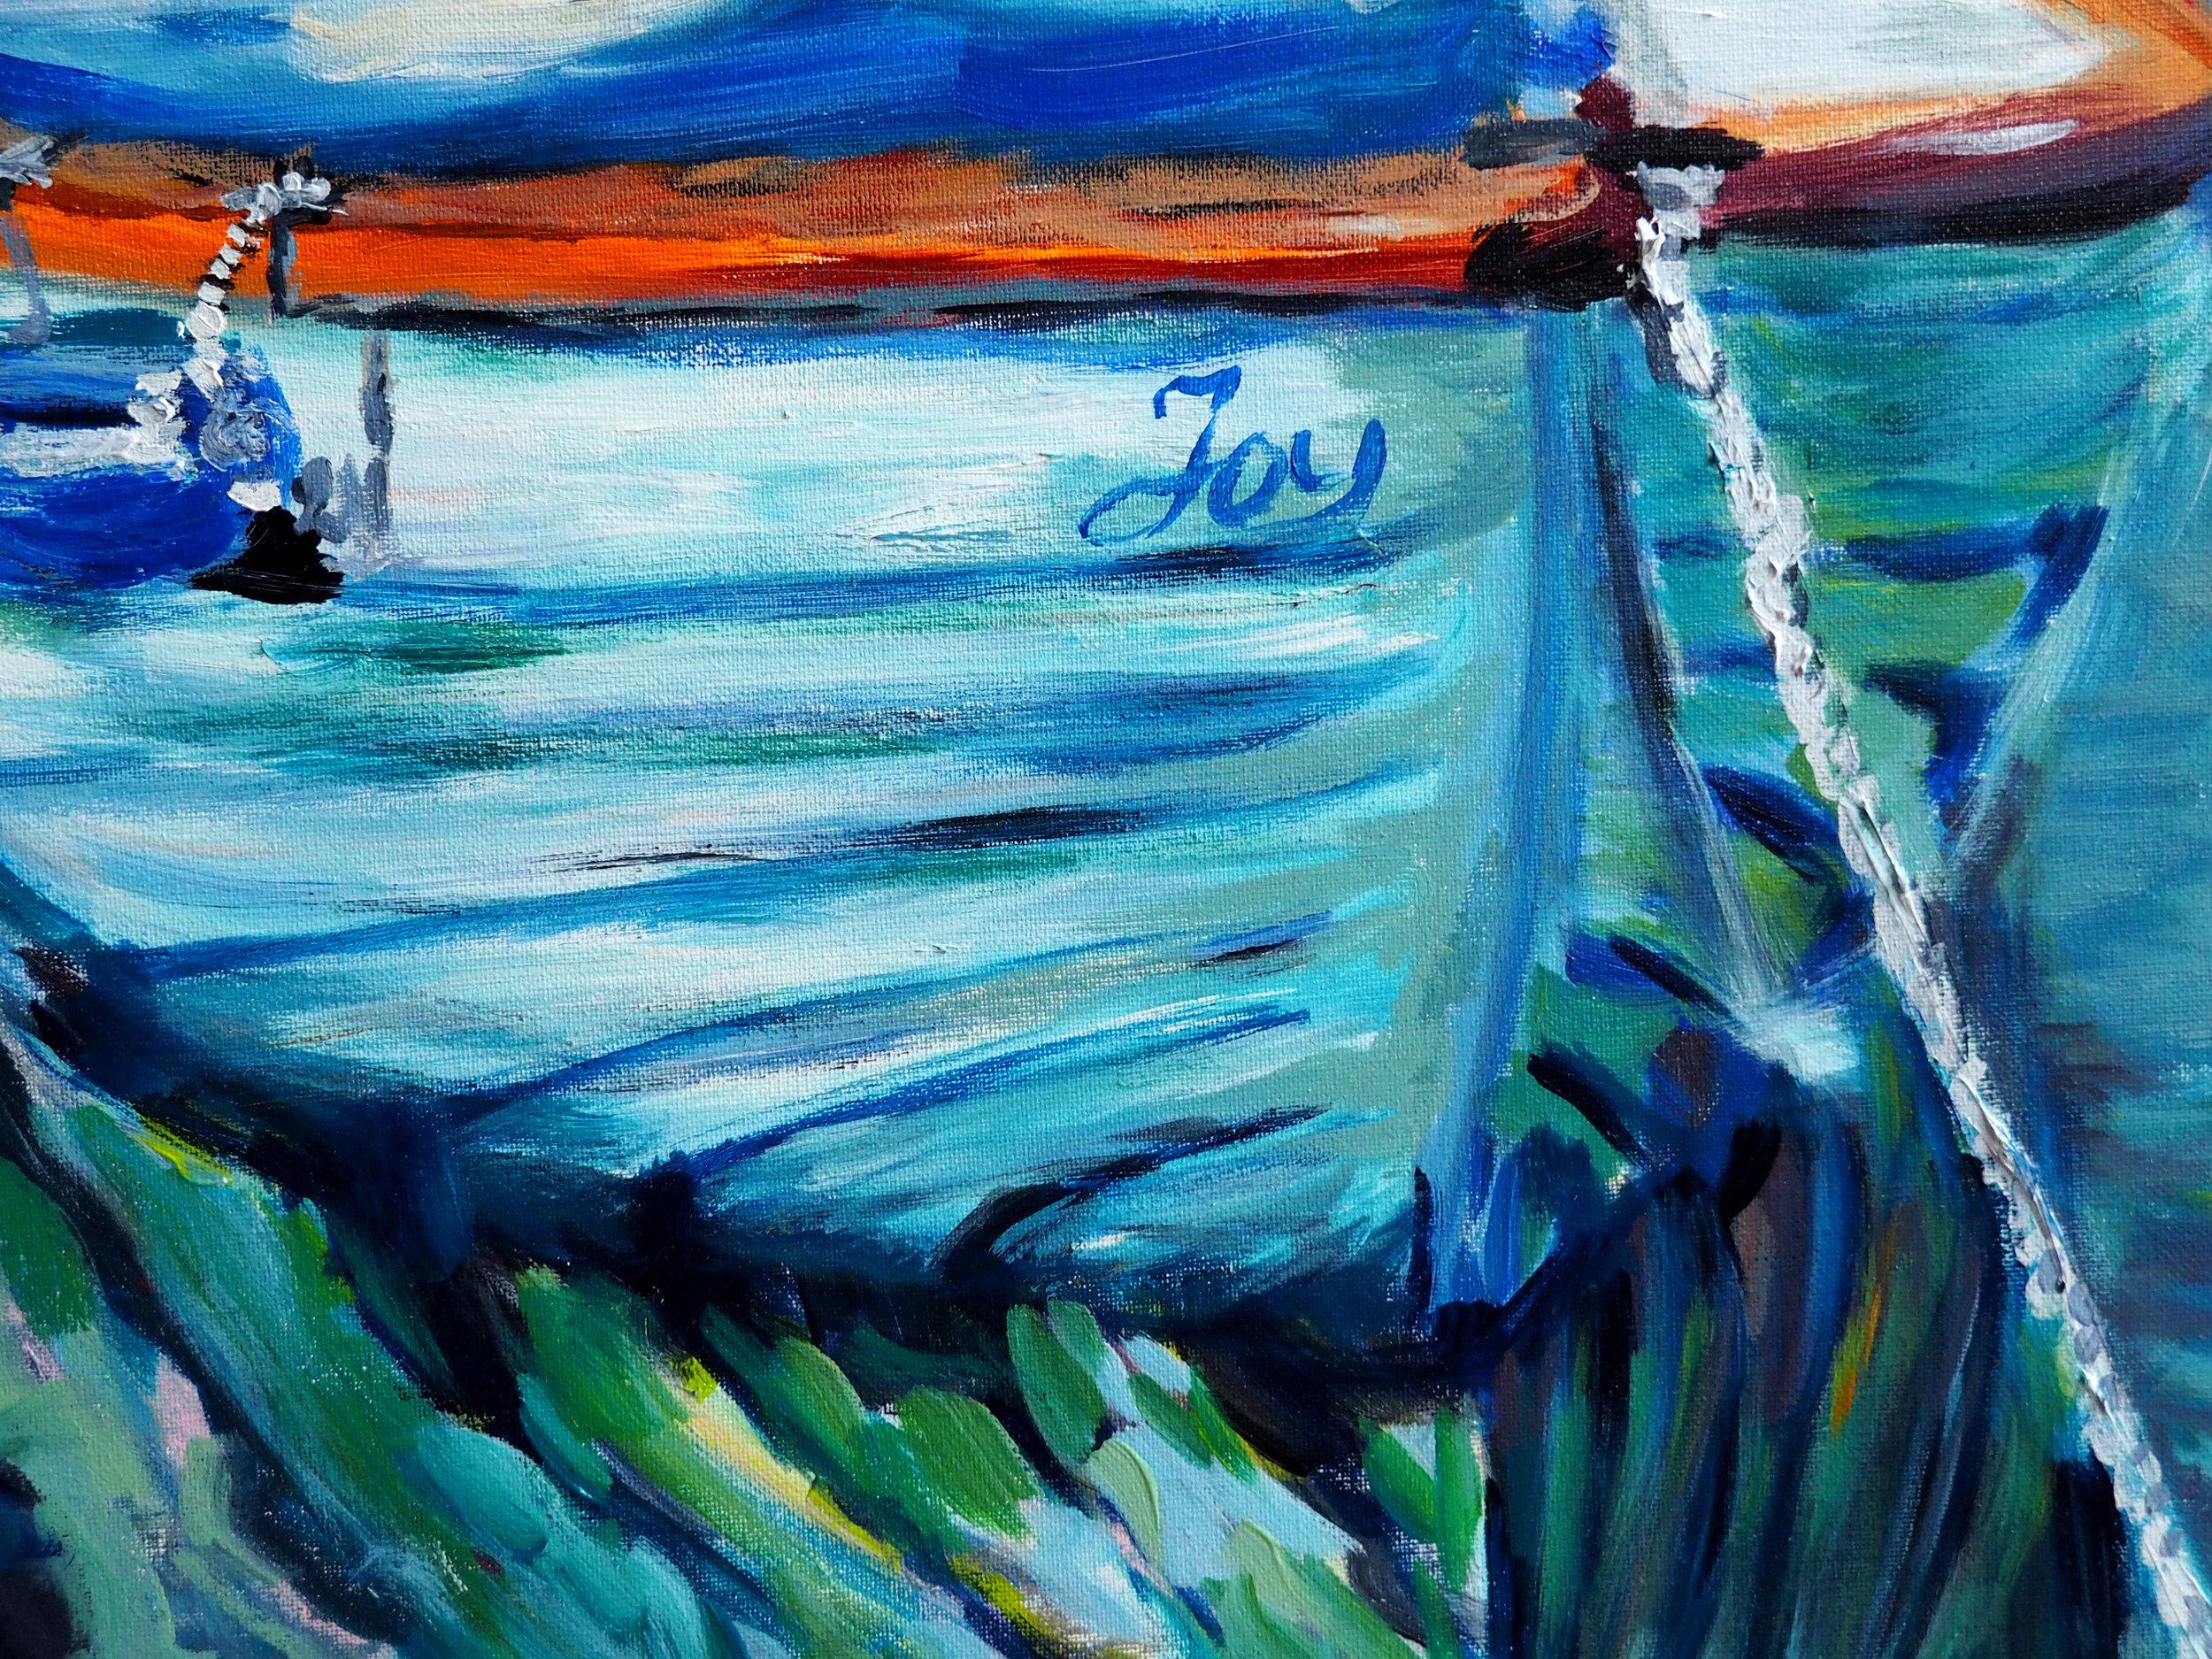 Carmen Griffen - boat of joy - 2018 - acrylic on canvas - 30x30cm.jpg